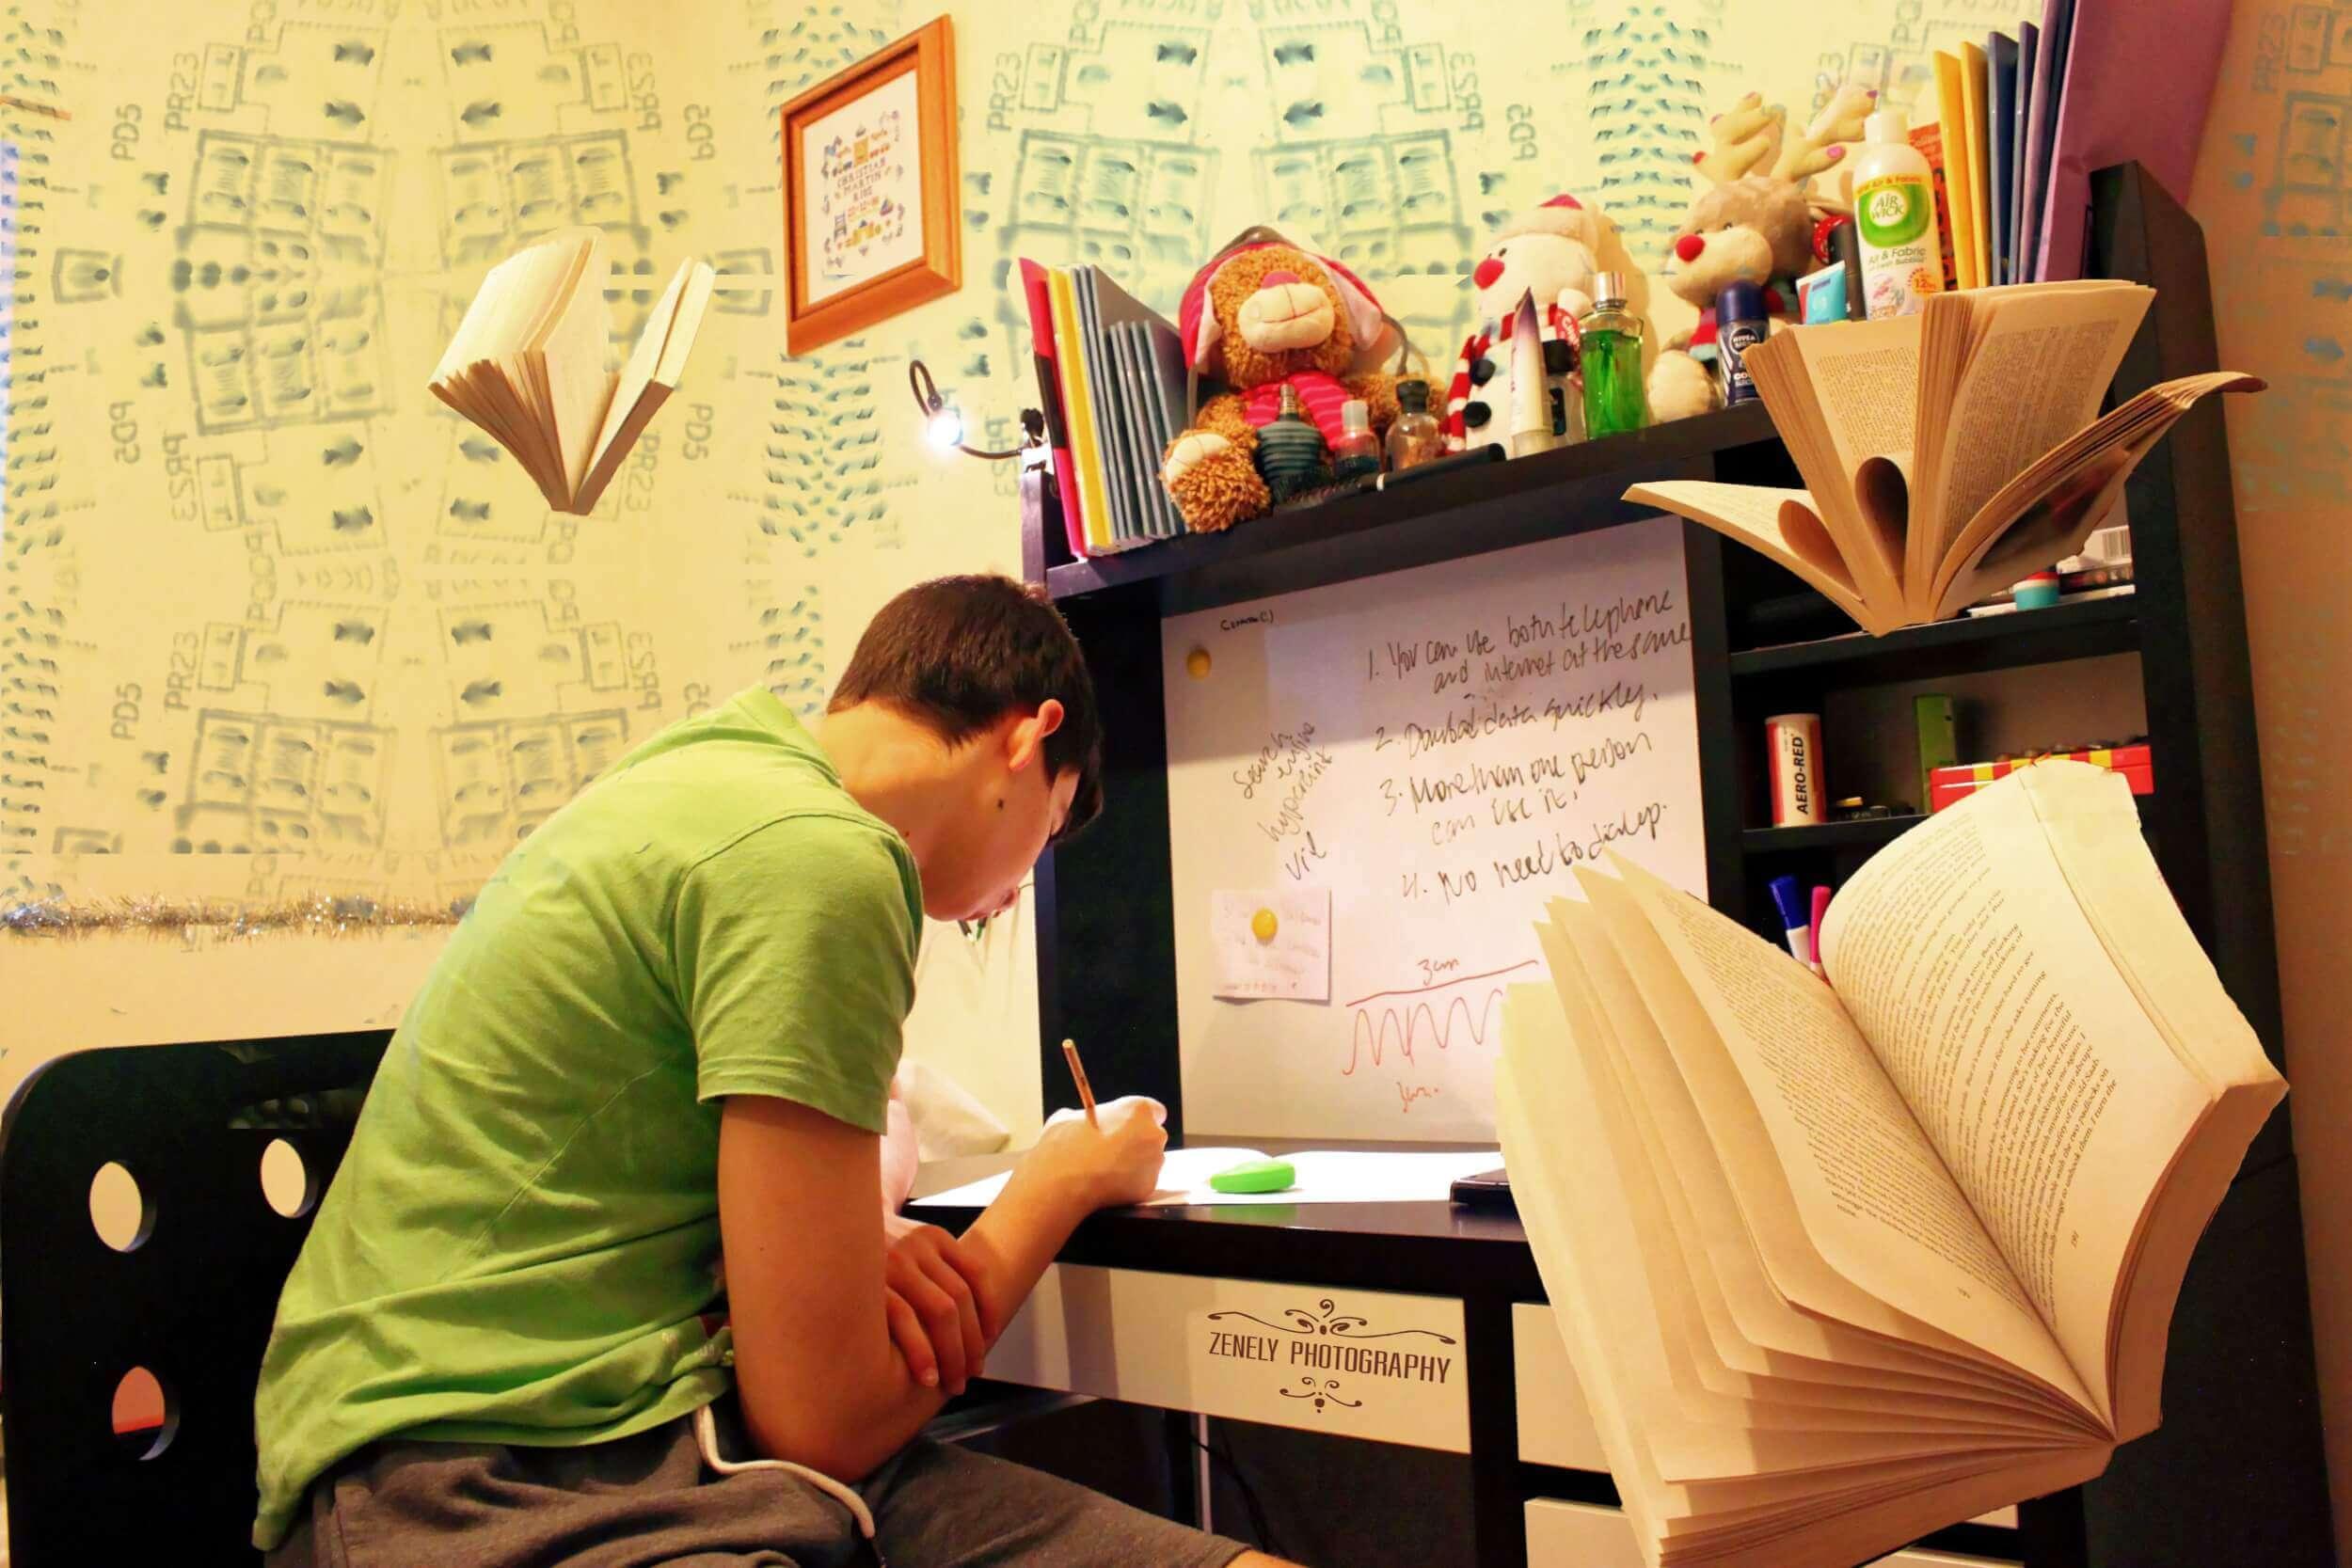 Studenten lernen eigenständig im Selbststudium (c) 27707 / pixabay.de